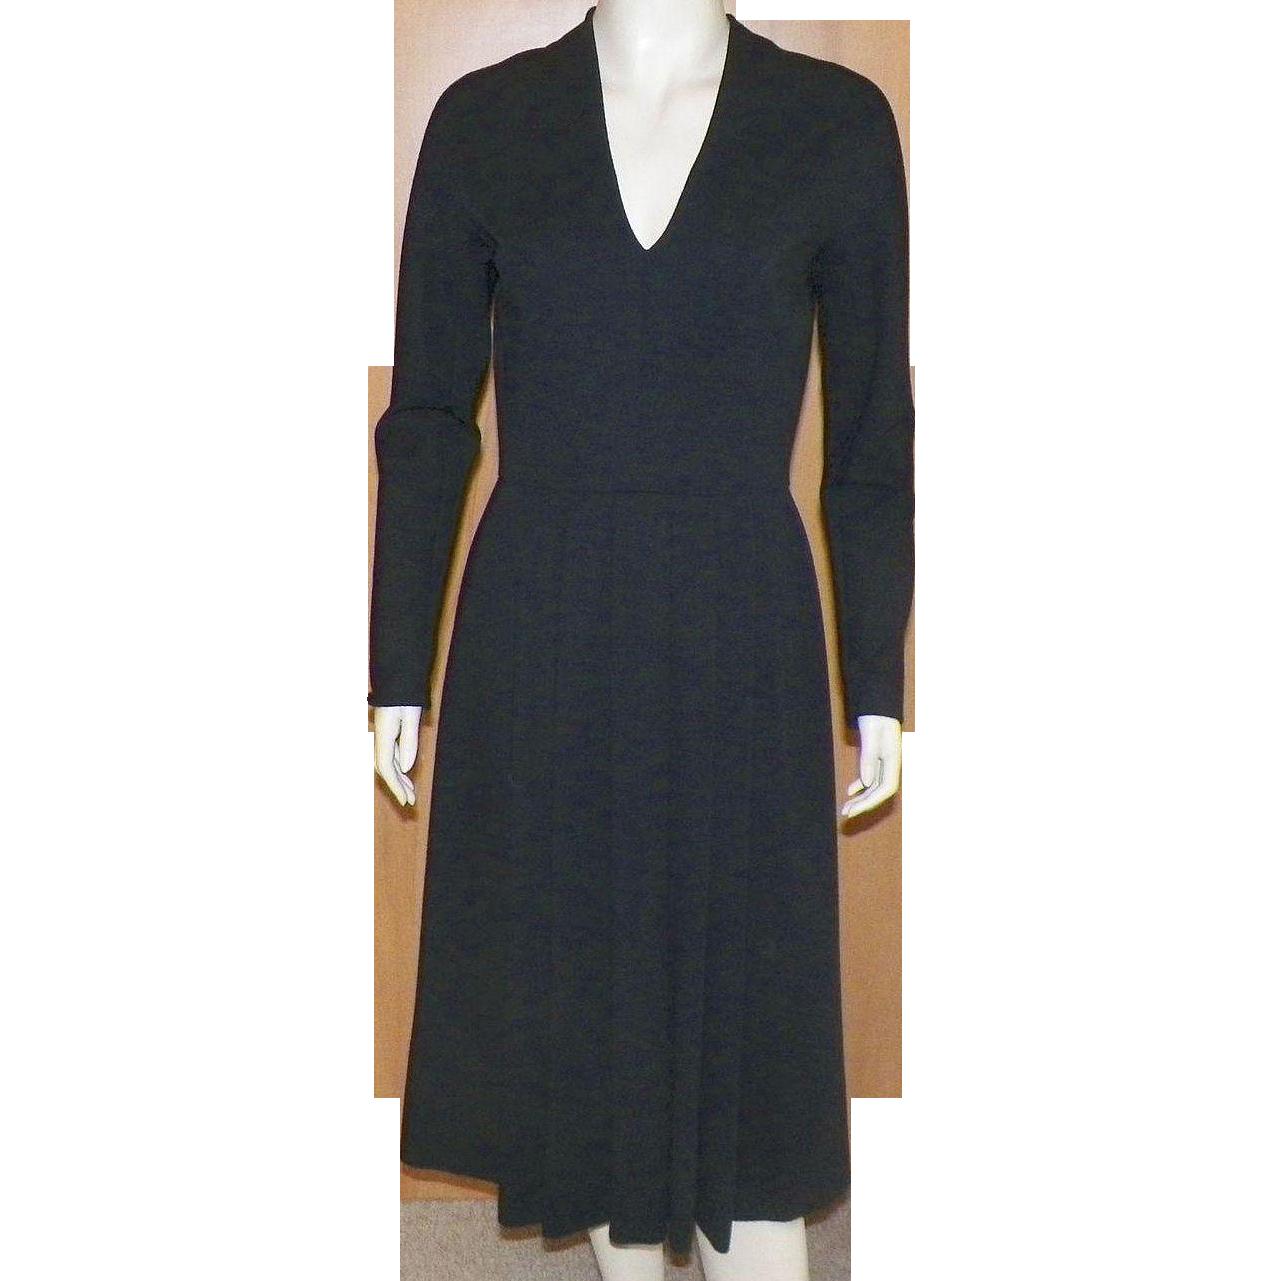 Vintage Pauline Trigere 1980's Classic Black Wool Dress